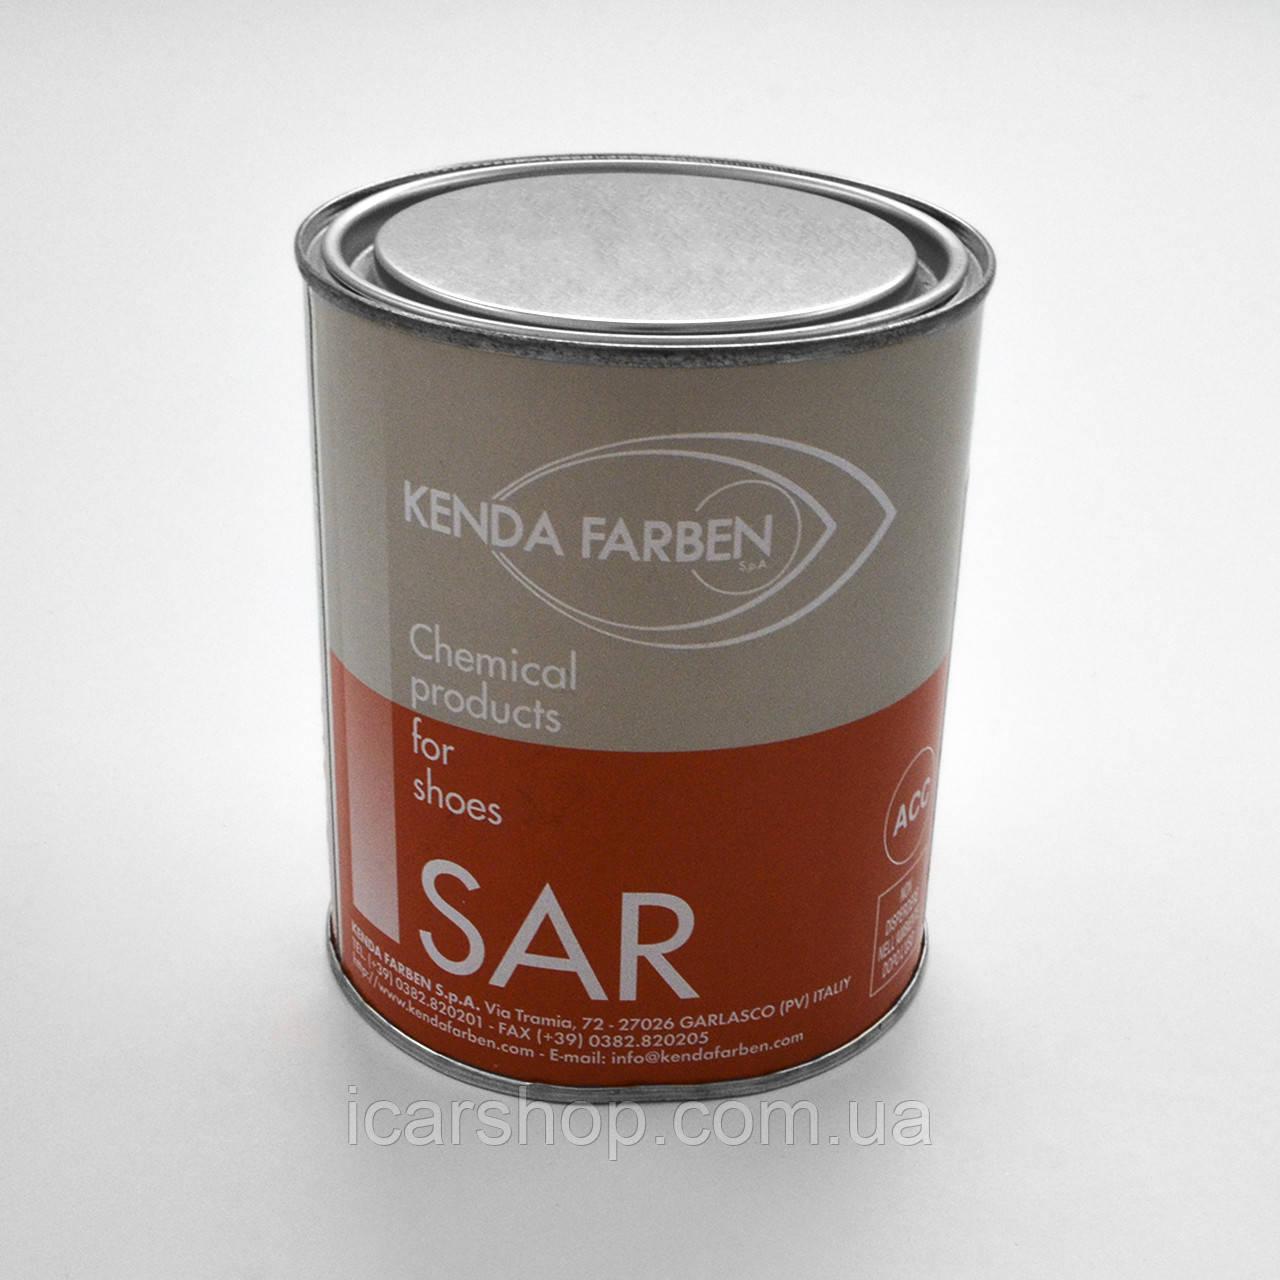 Клей Kenda Farben SAR 06 W (1kg)